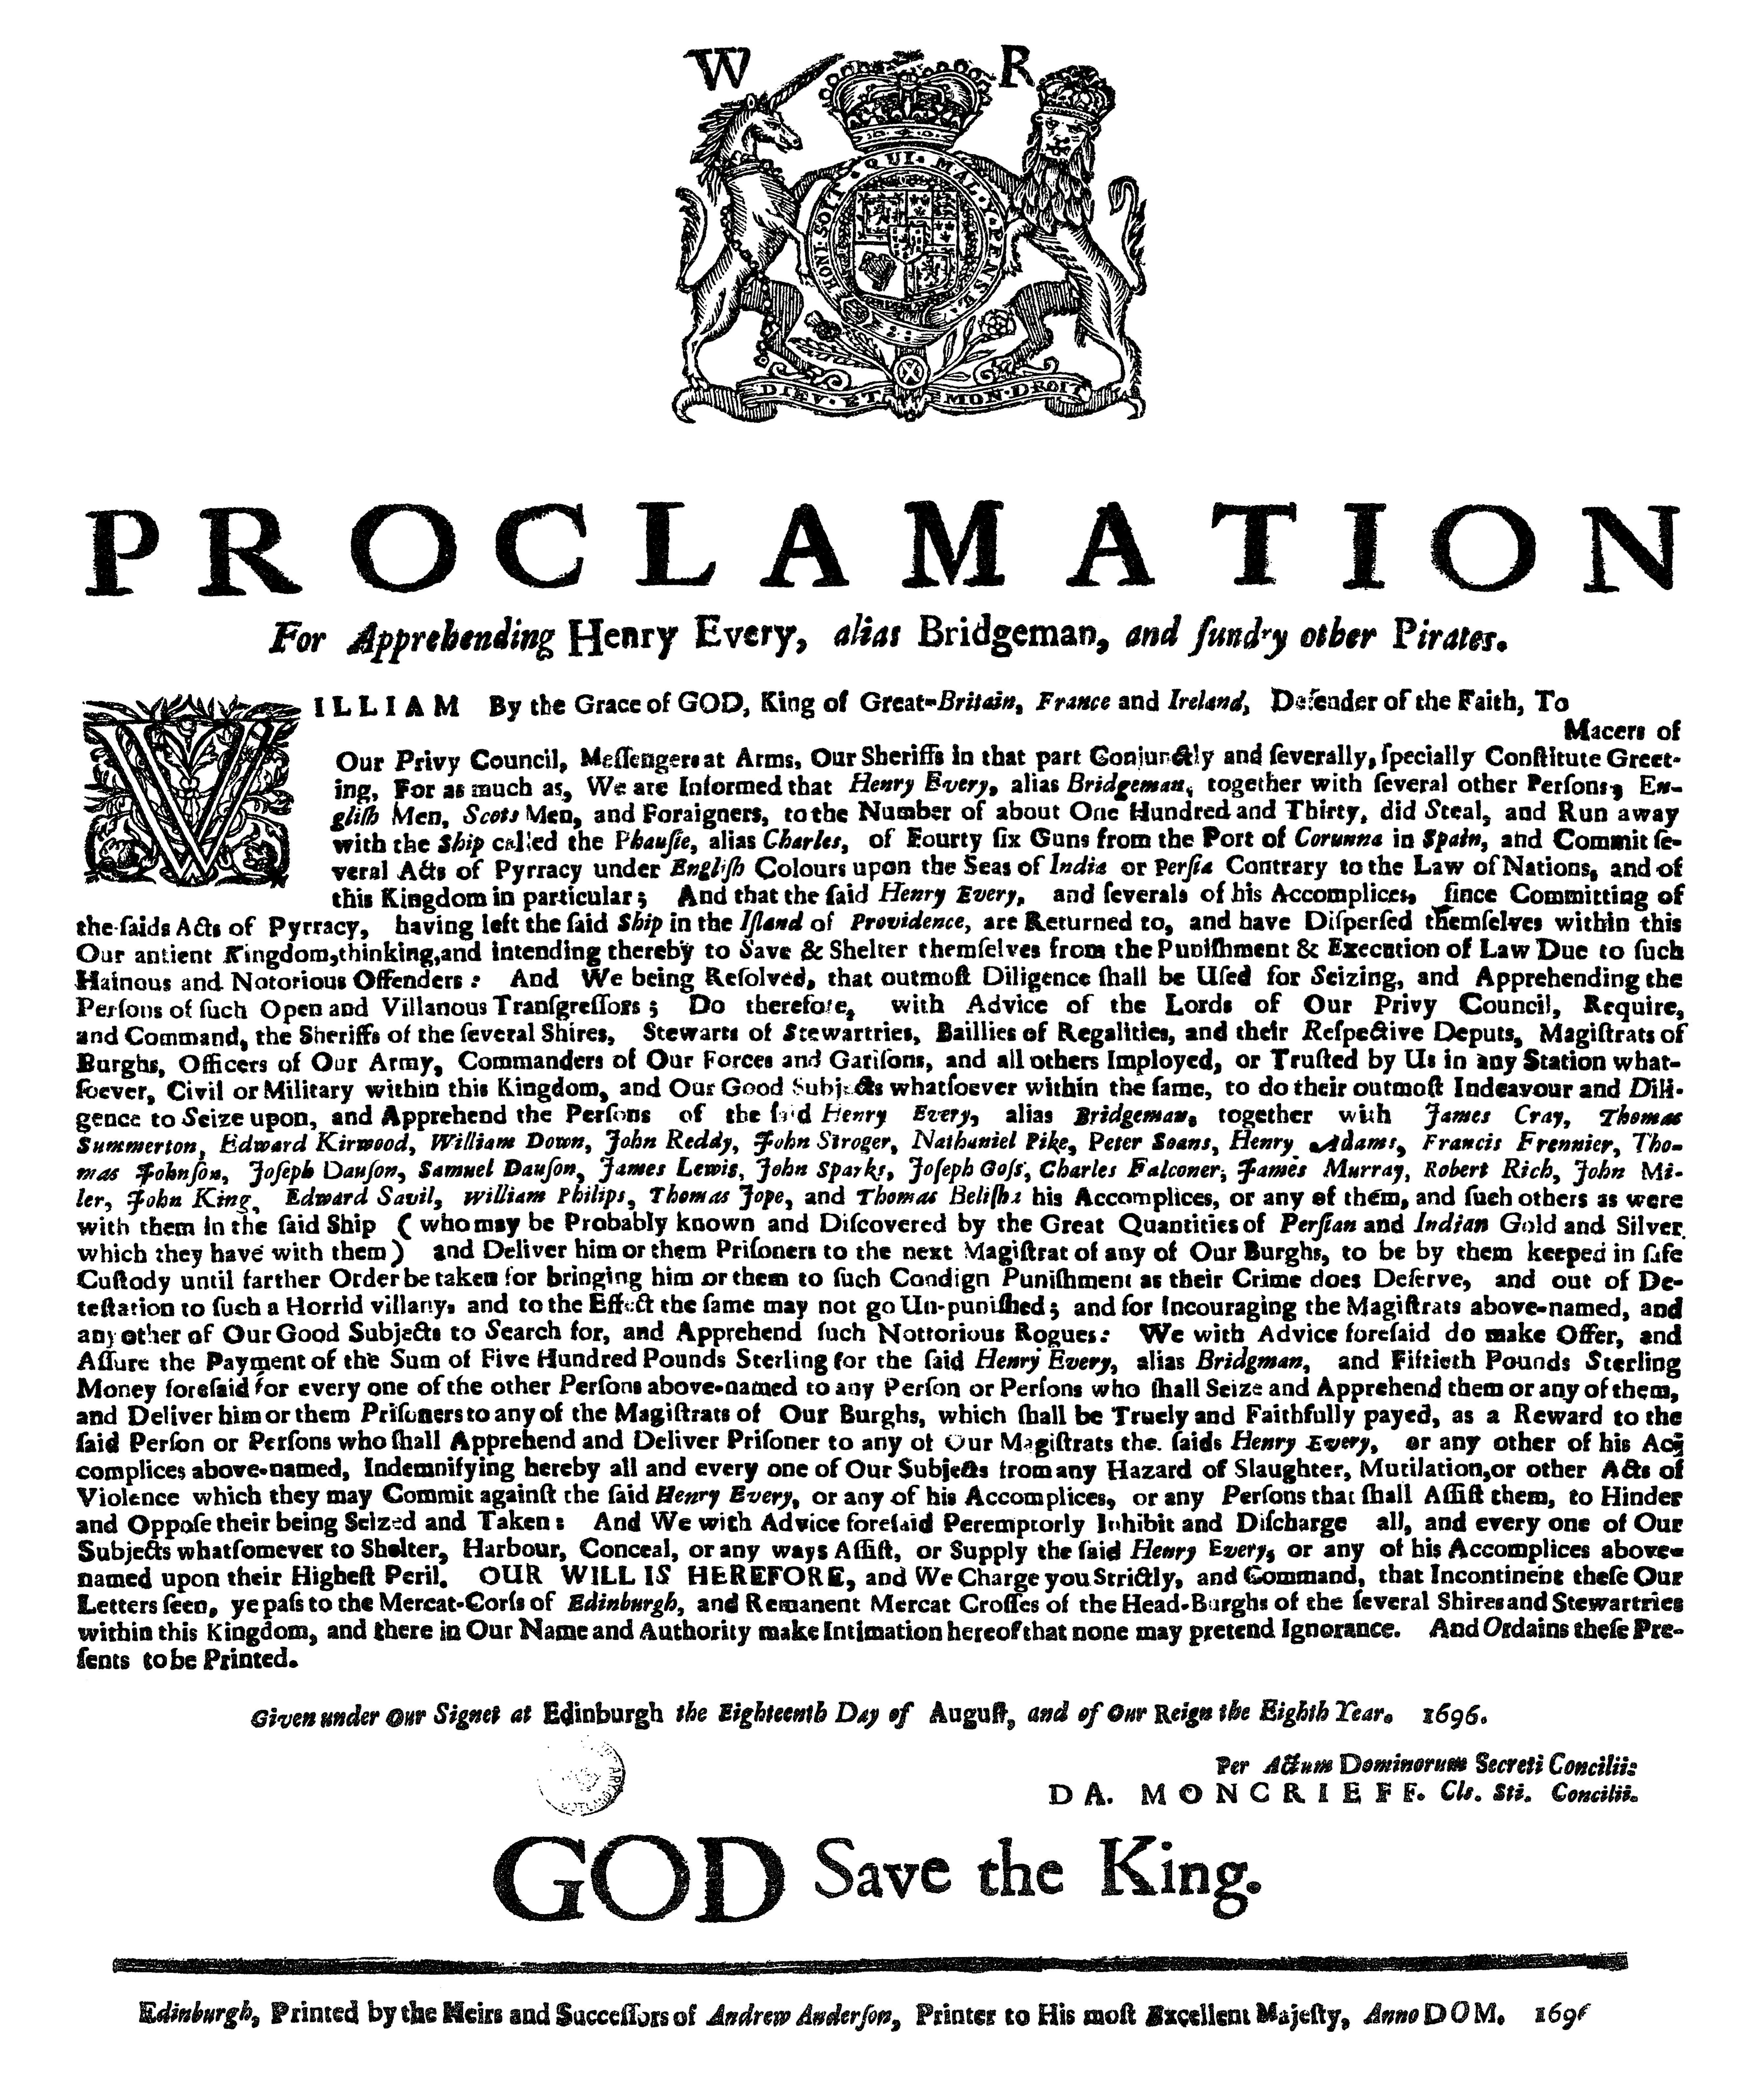 Proclamation_for_apprehending_Henry_Every.jpg